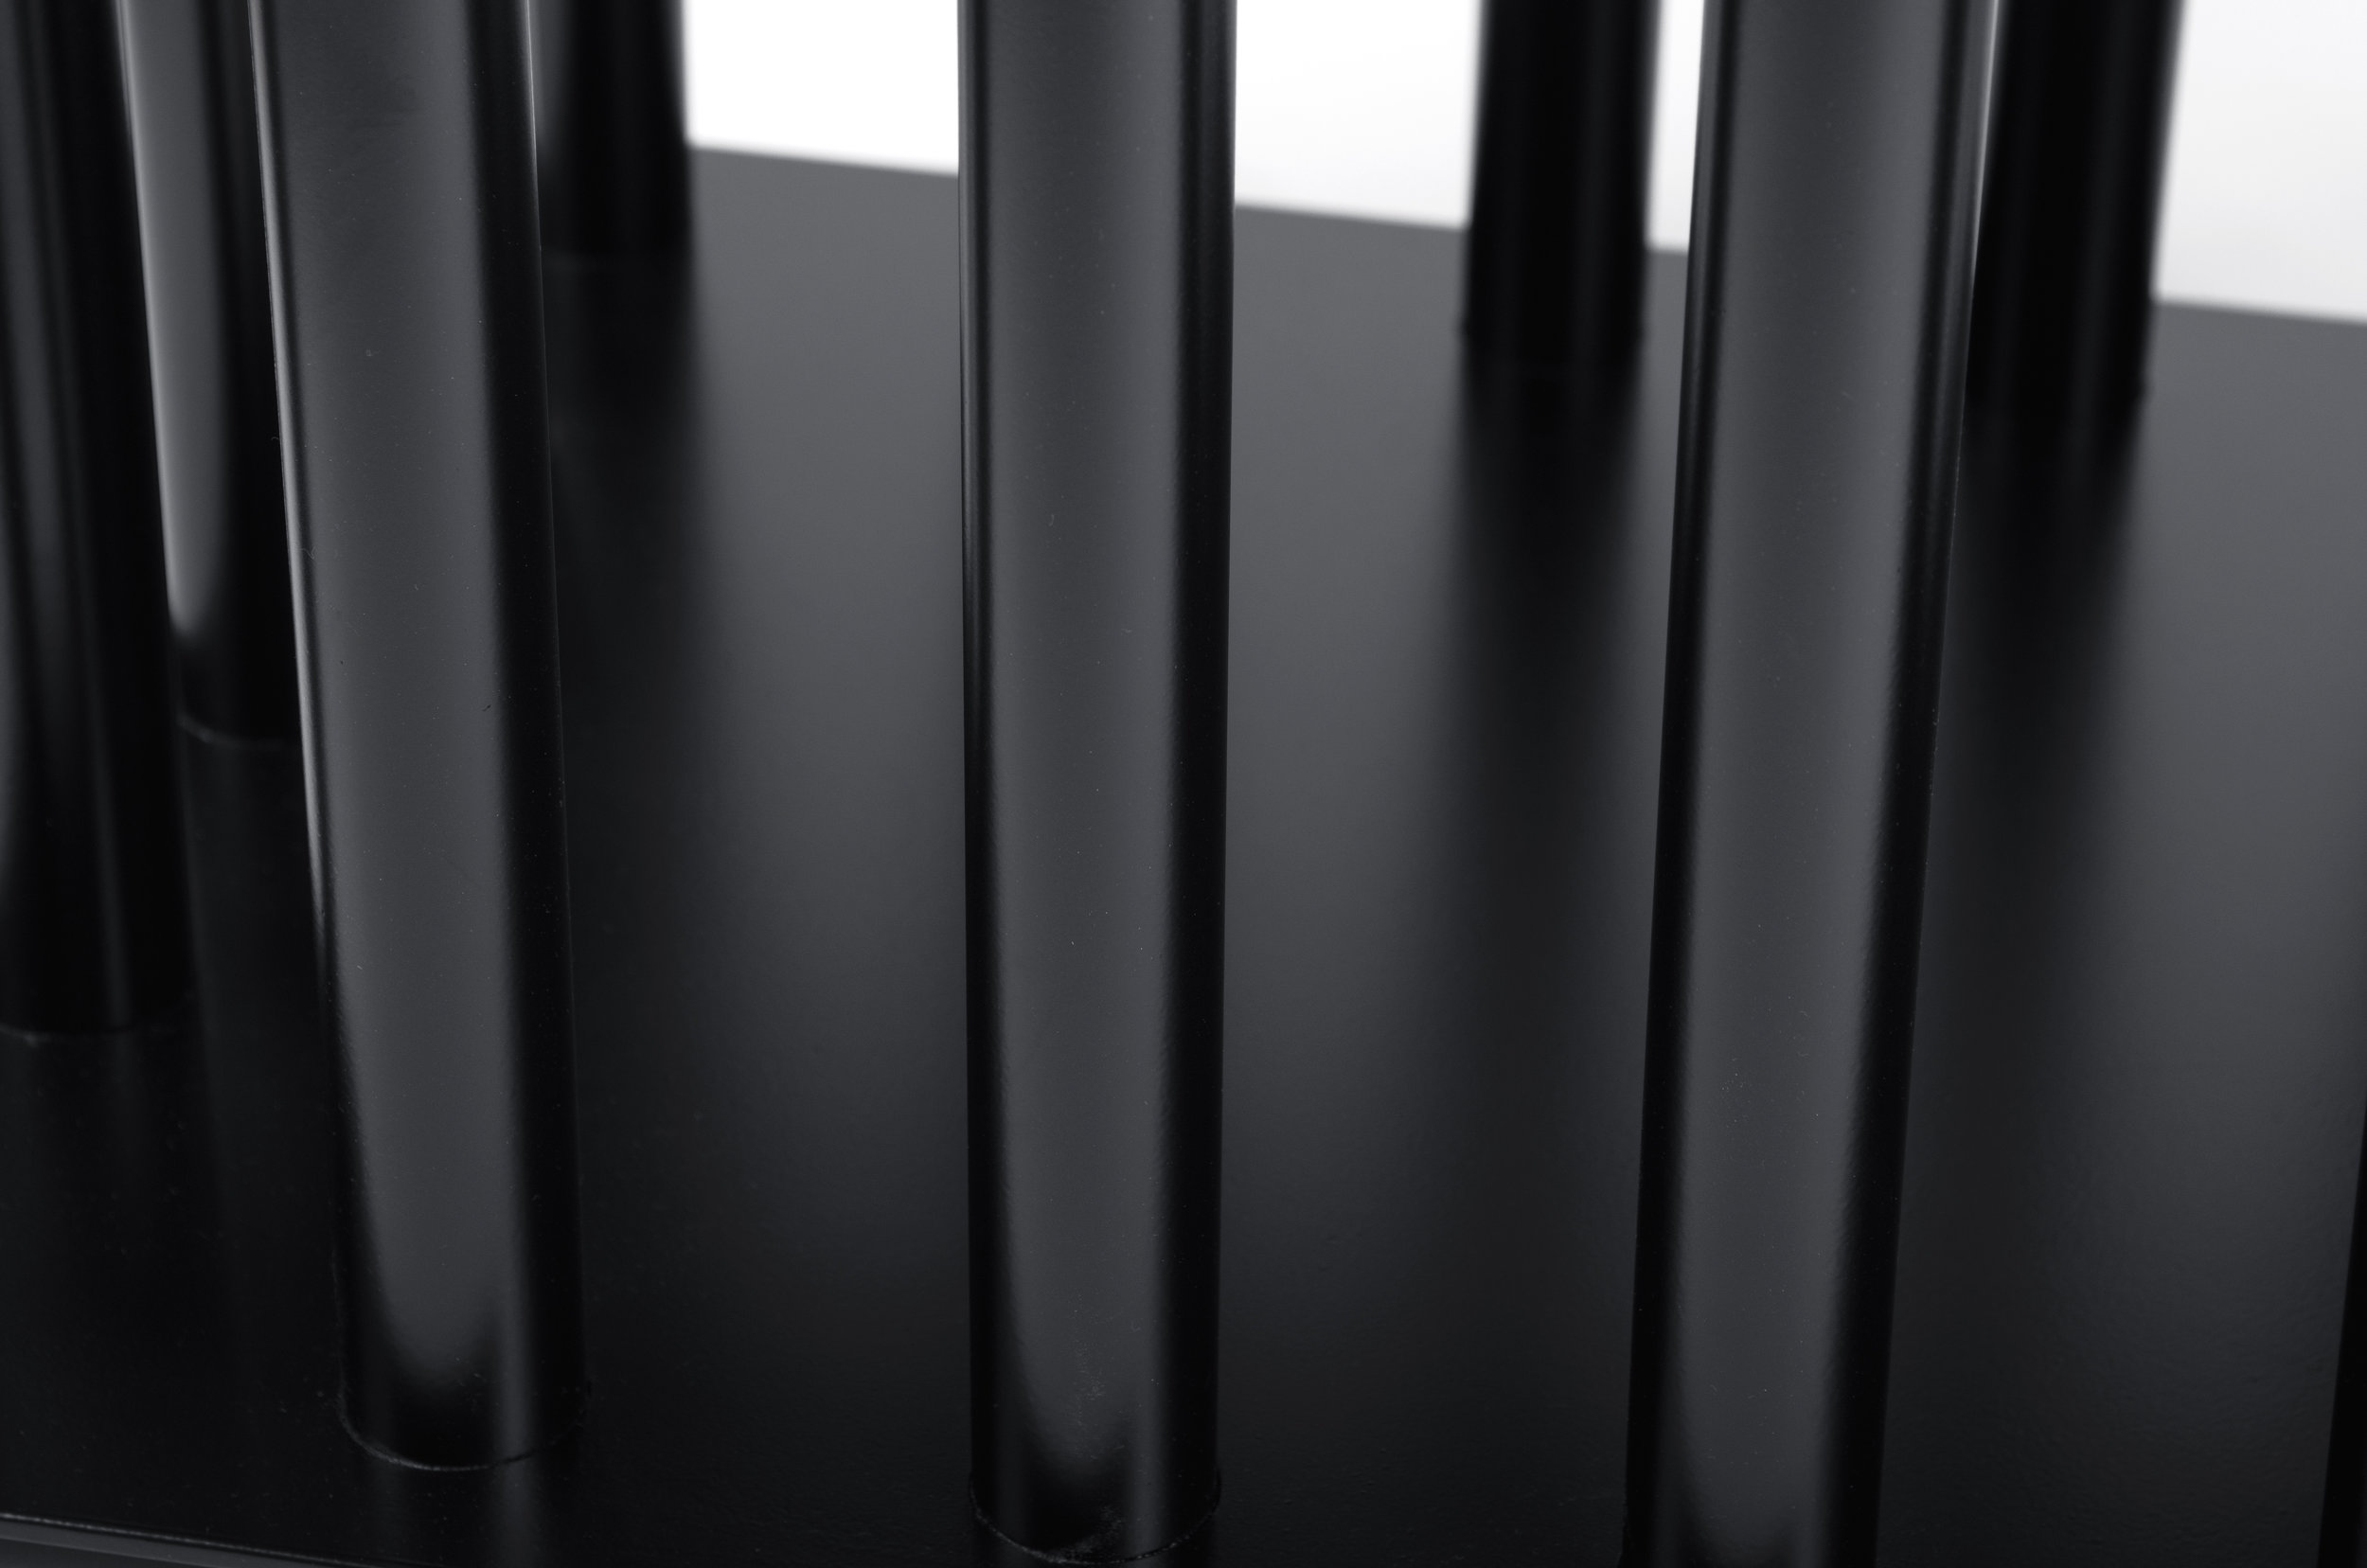 jorge-diego-etienne-cages-18